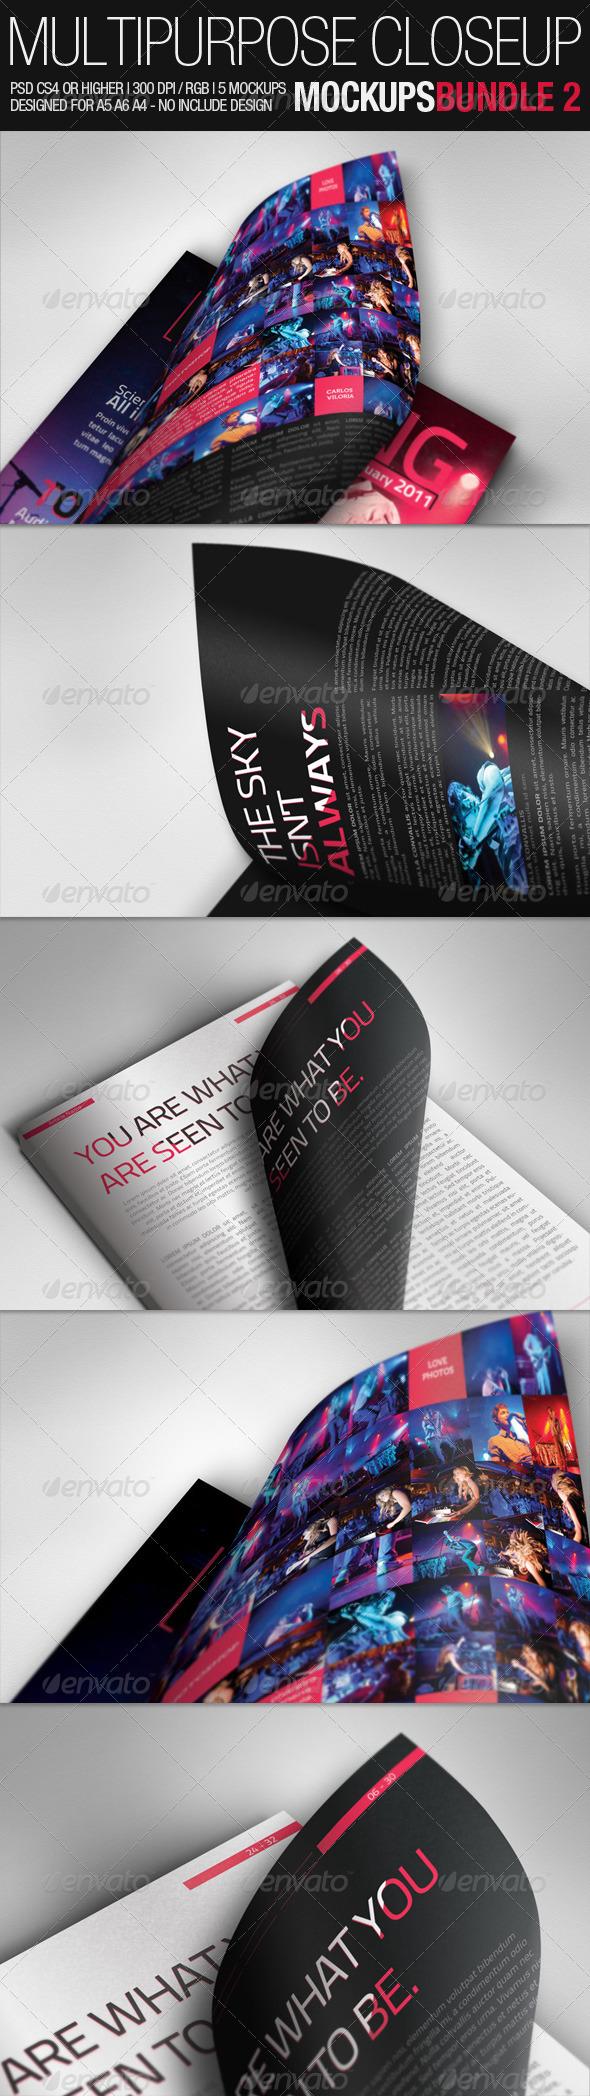 Multipurpose Closeup Mockups Bundle 02 - Miscellaneous Print